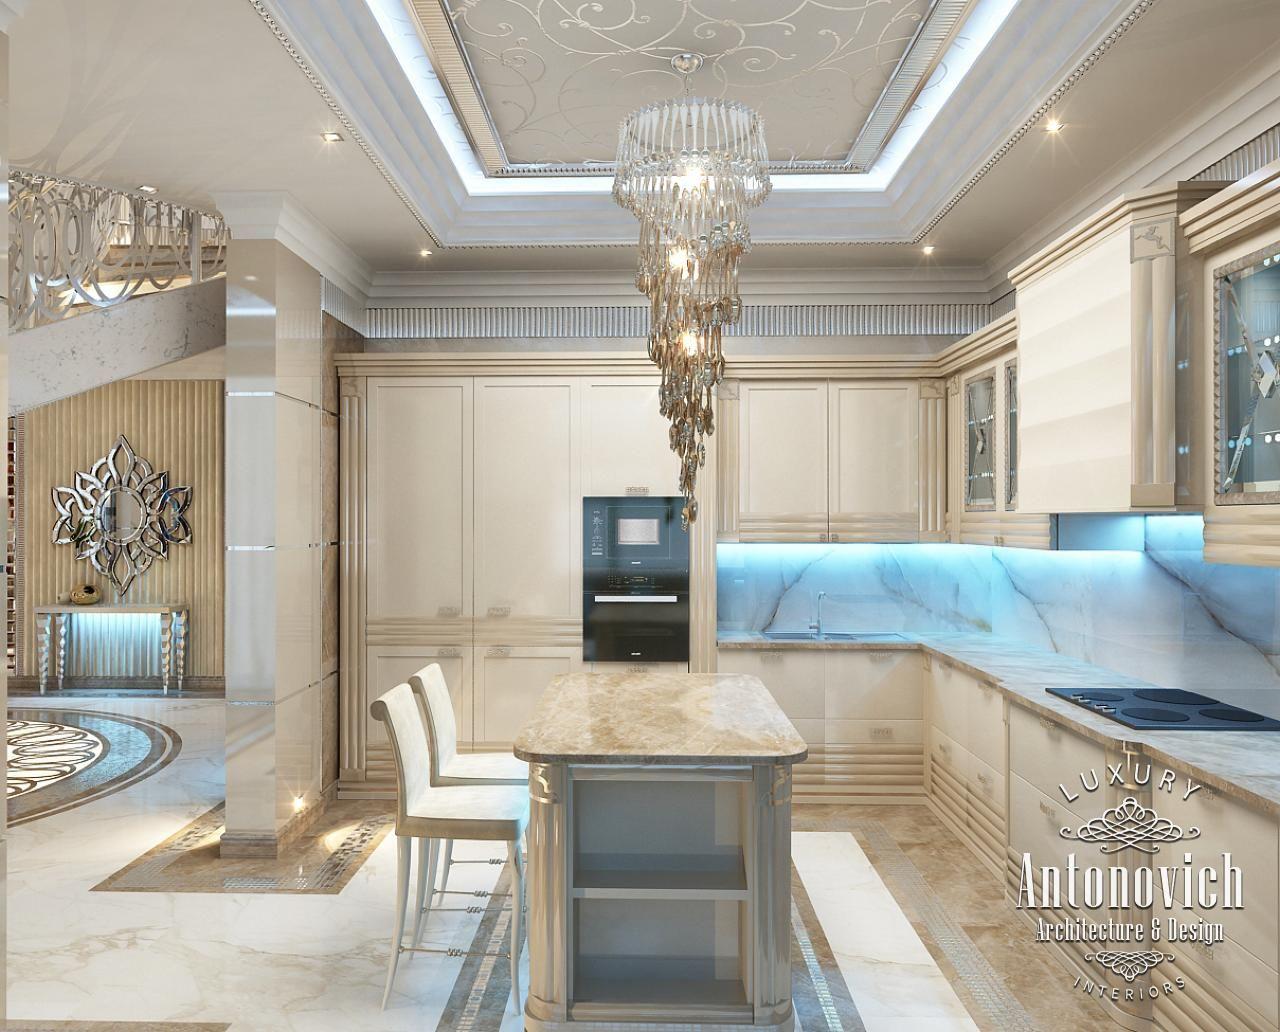 Luxury interior design Dubai from Katrina Antonovich always involves ...